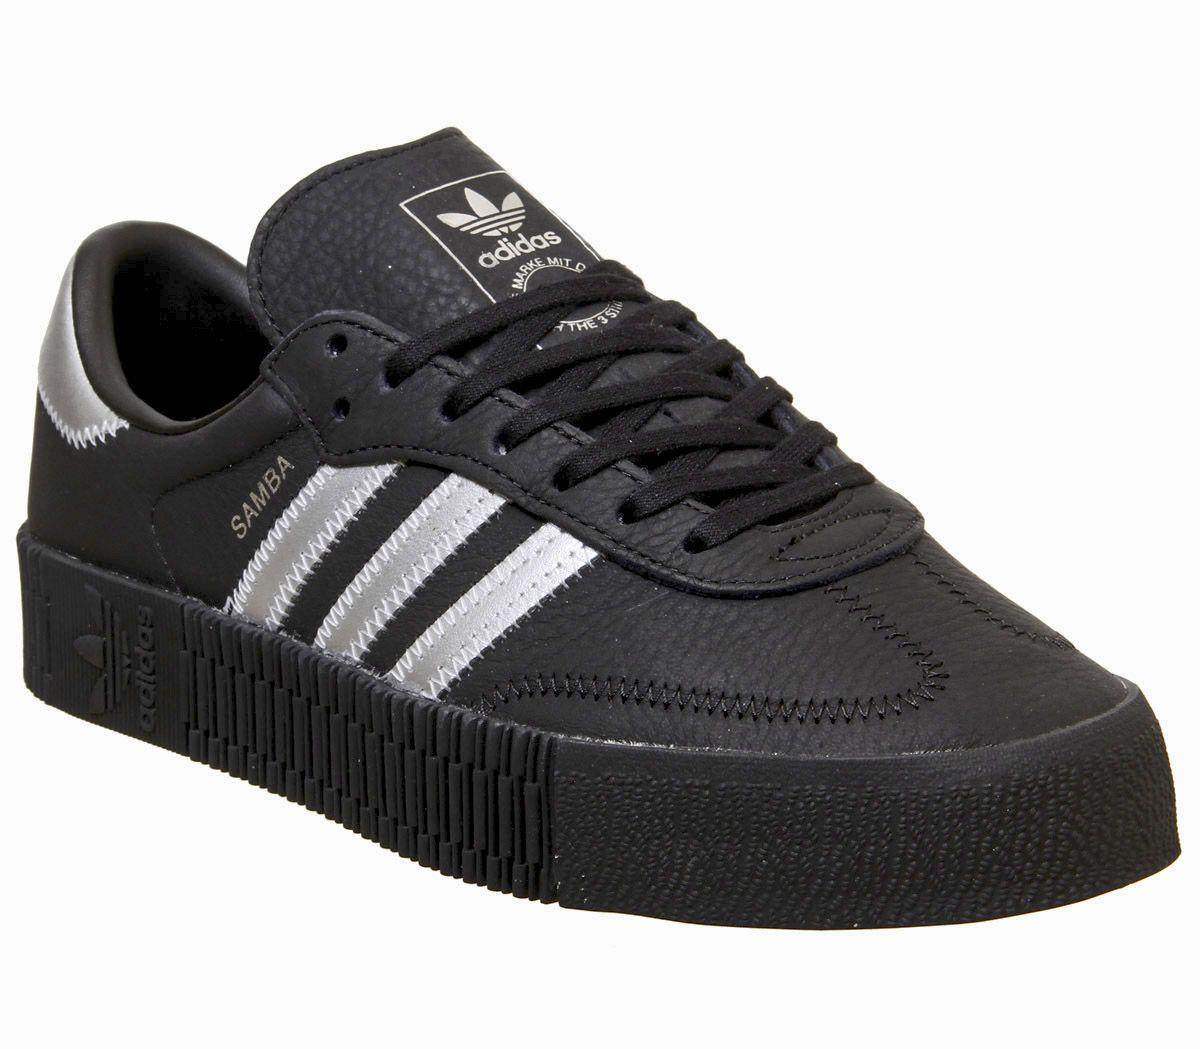 womens black & silver adidas sambarose trainers  schuh